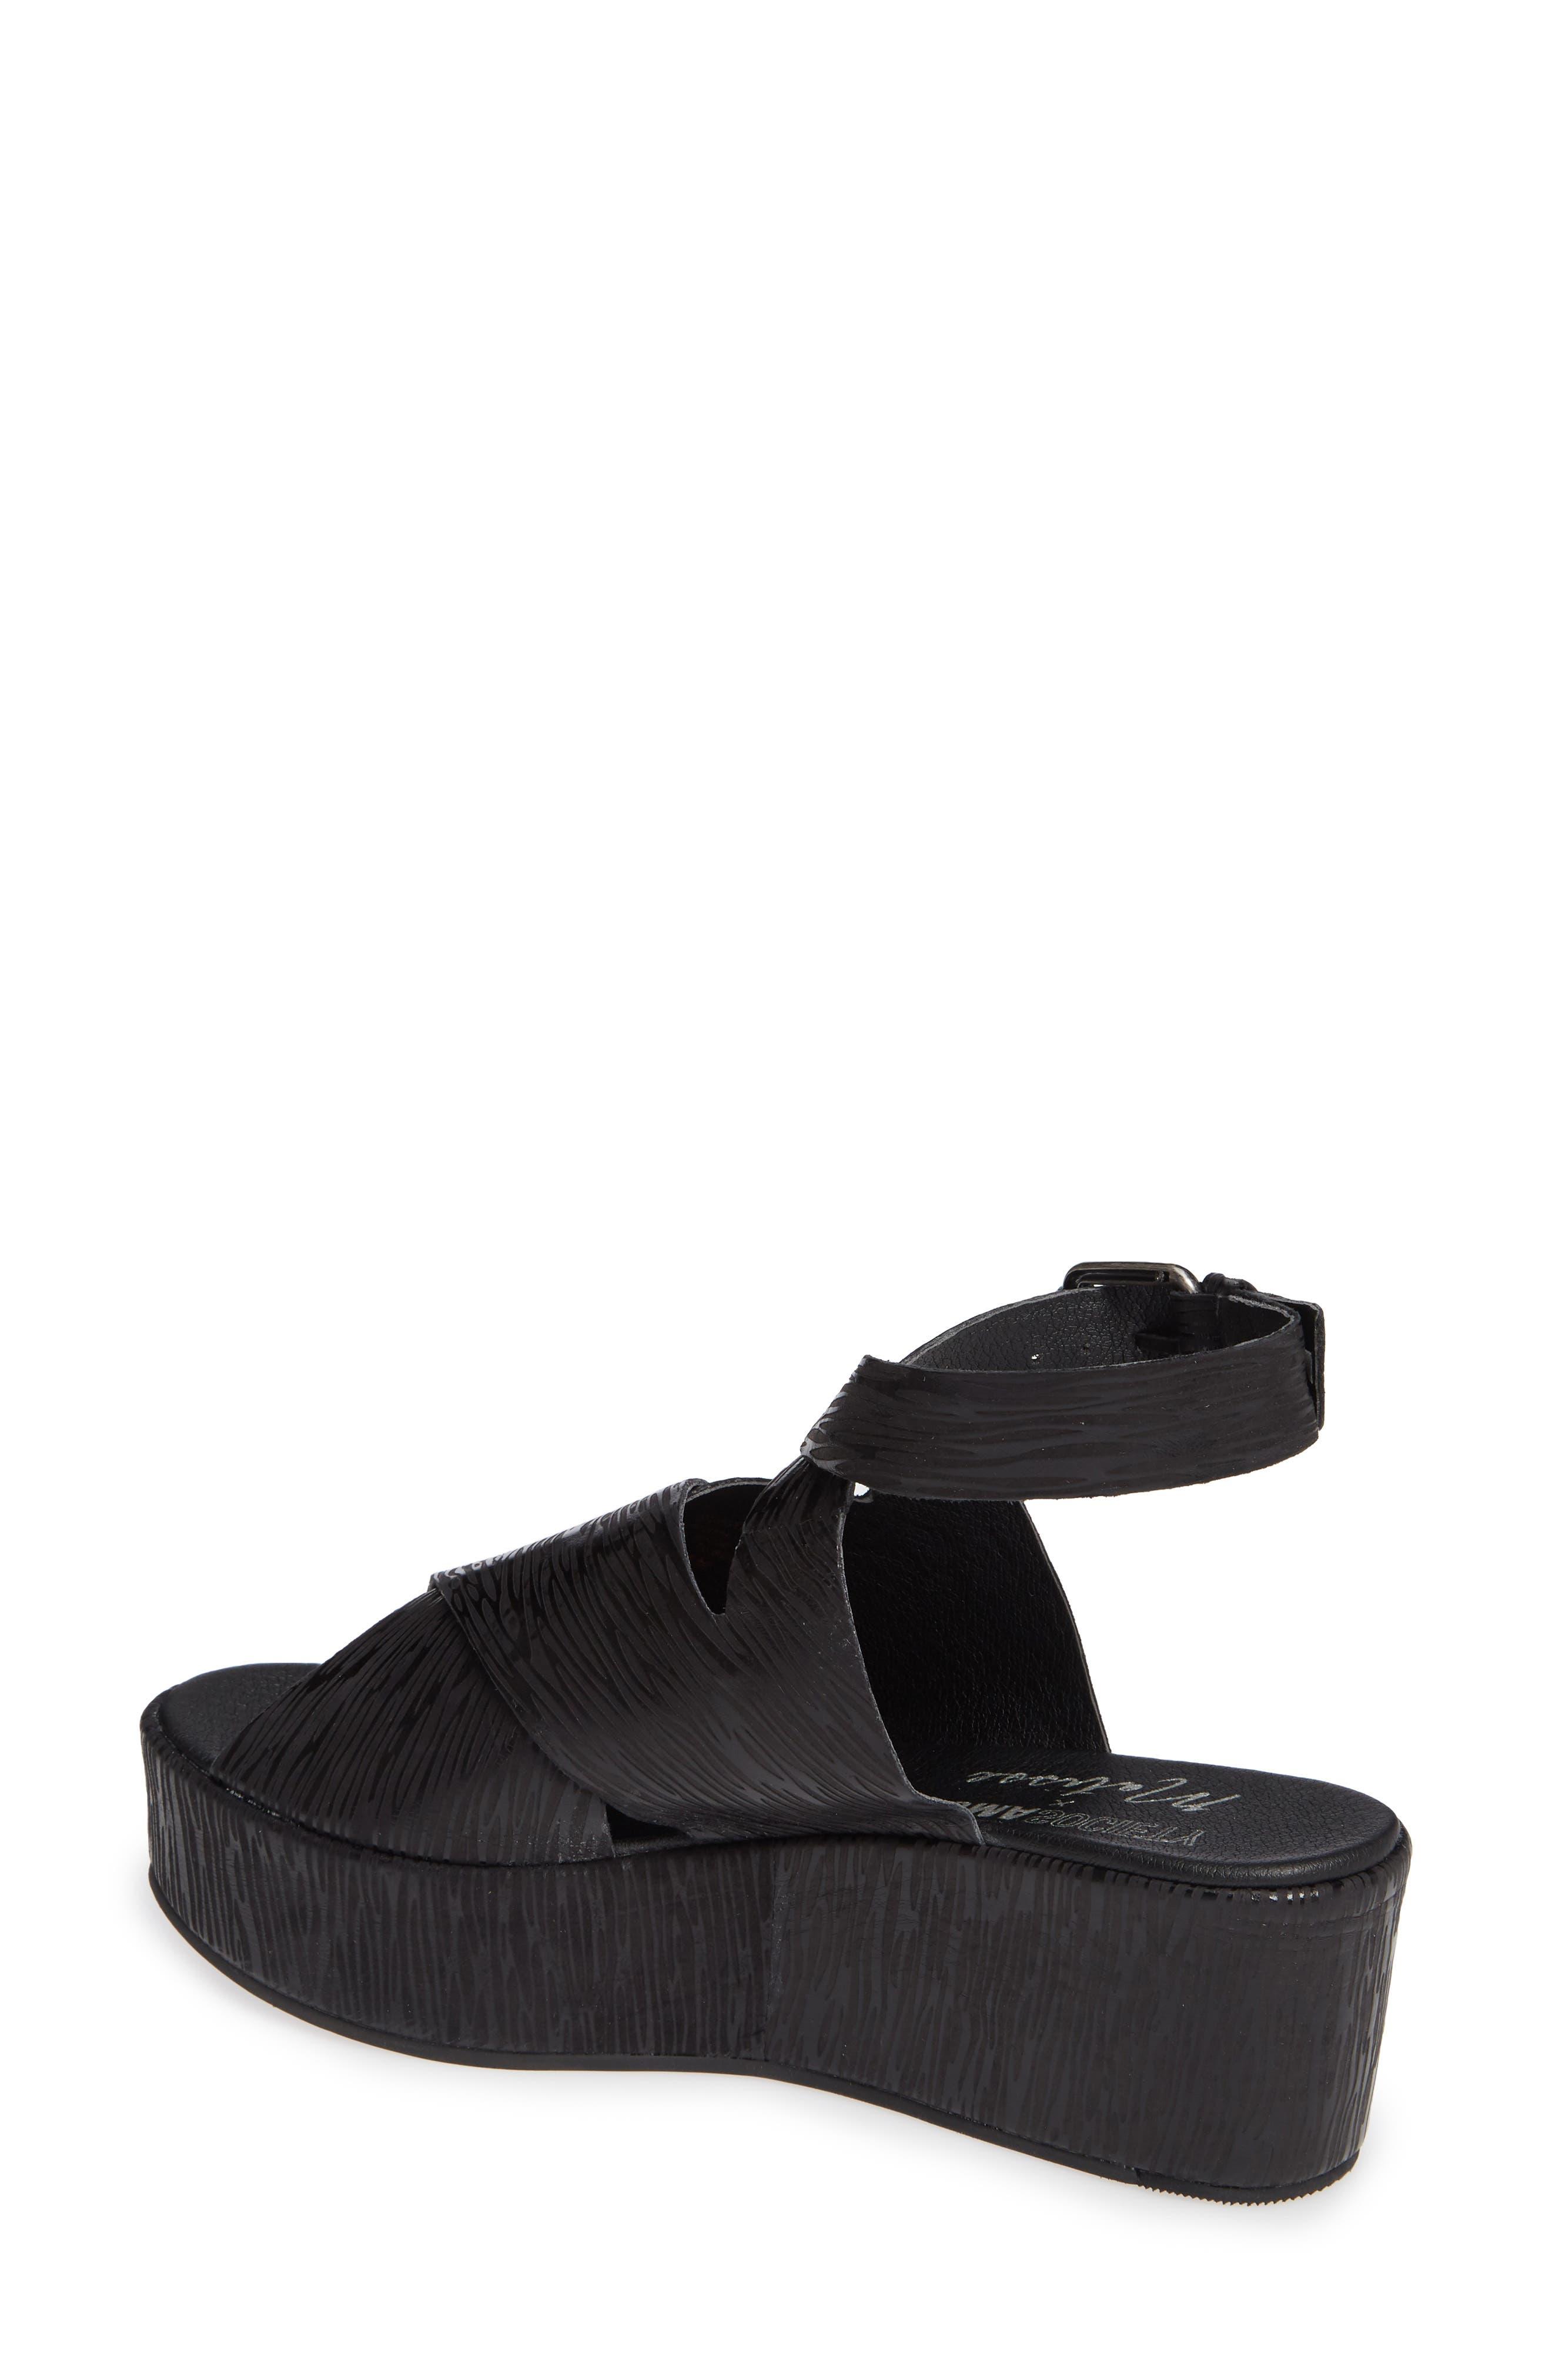 Runaway Wedge Sandal,                             Alternate thumbnail 2, color,                             BLACK LIZARD PRINT LEATHER